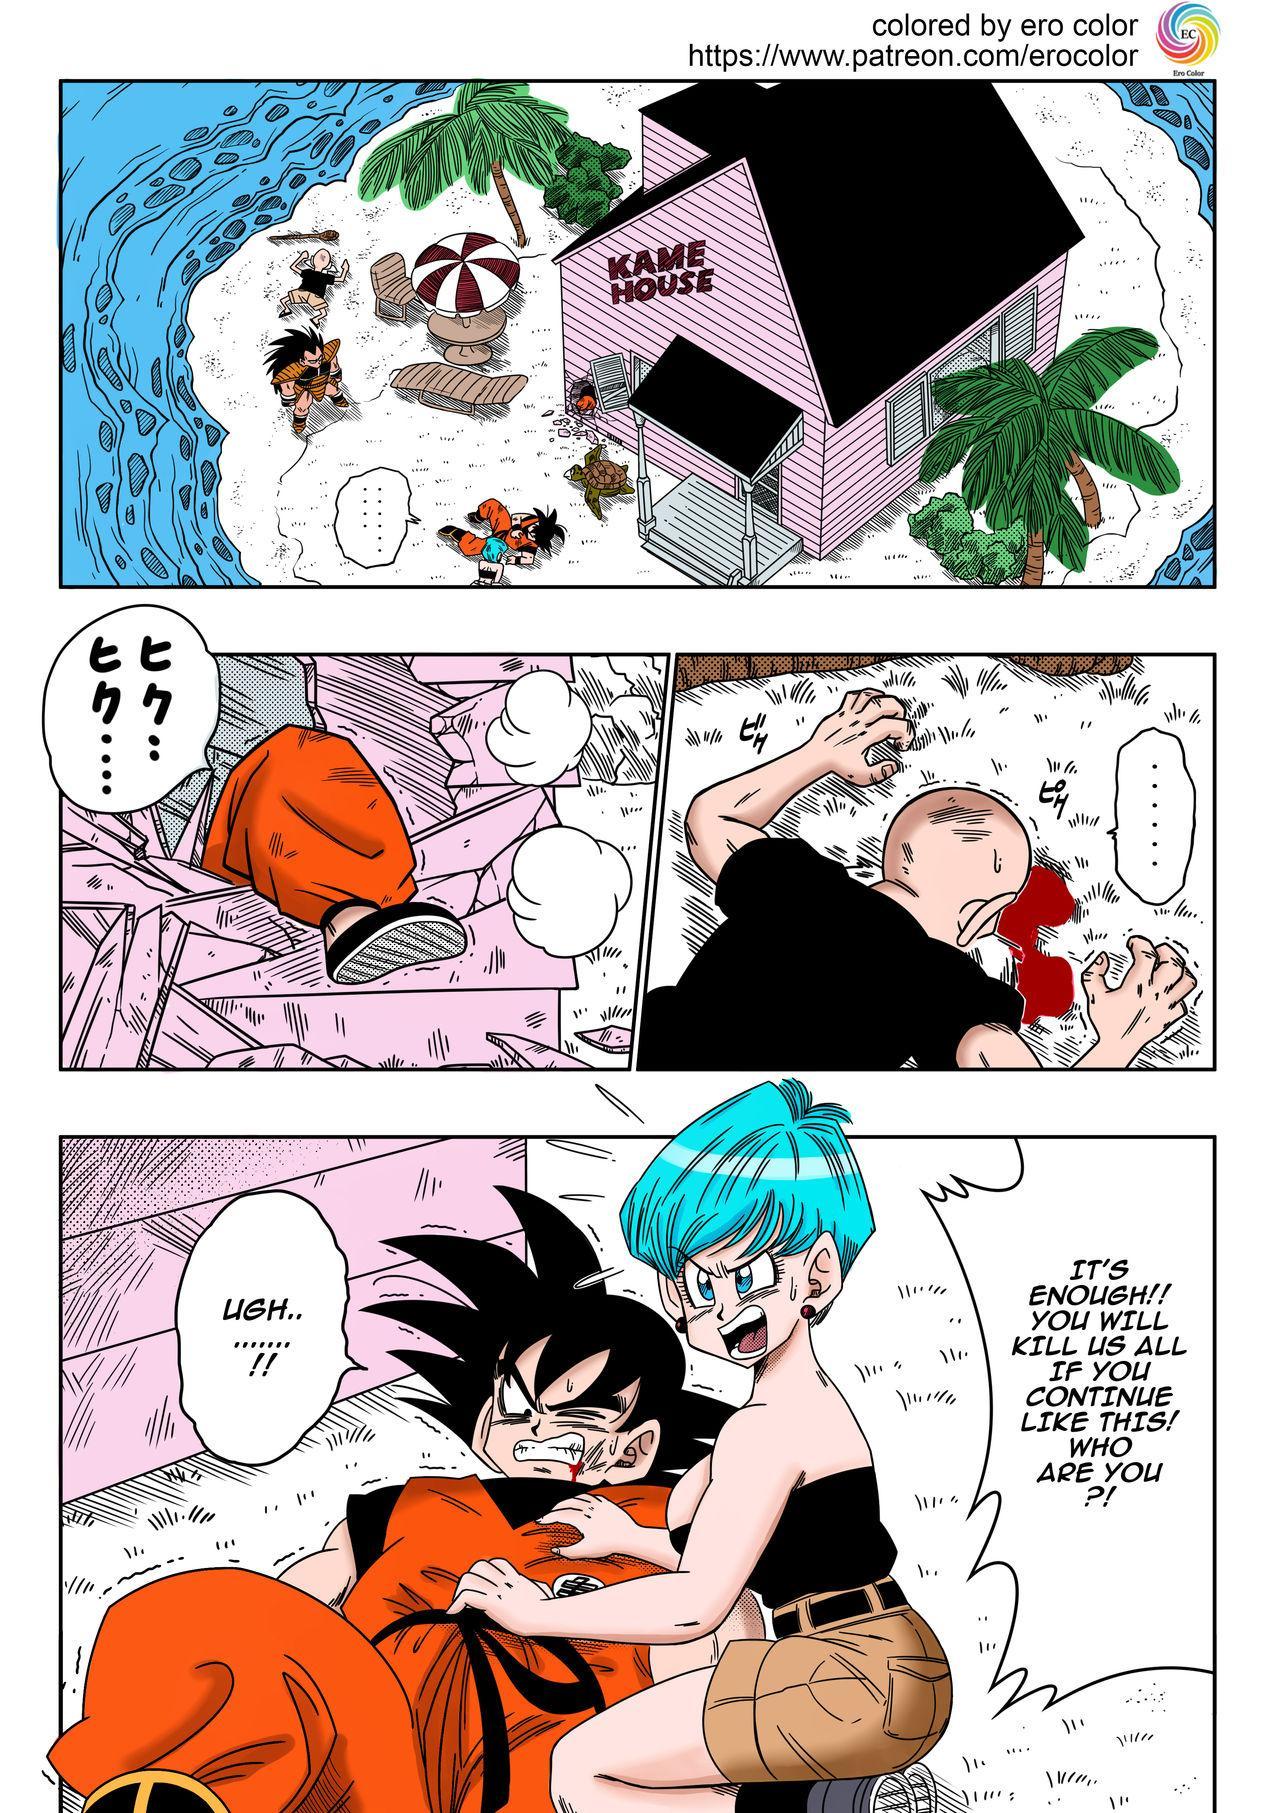 Warui Aniki - Bulma ga Yuukai Sareta!   EVIL BROTHER 1